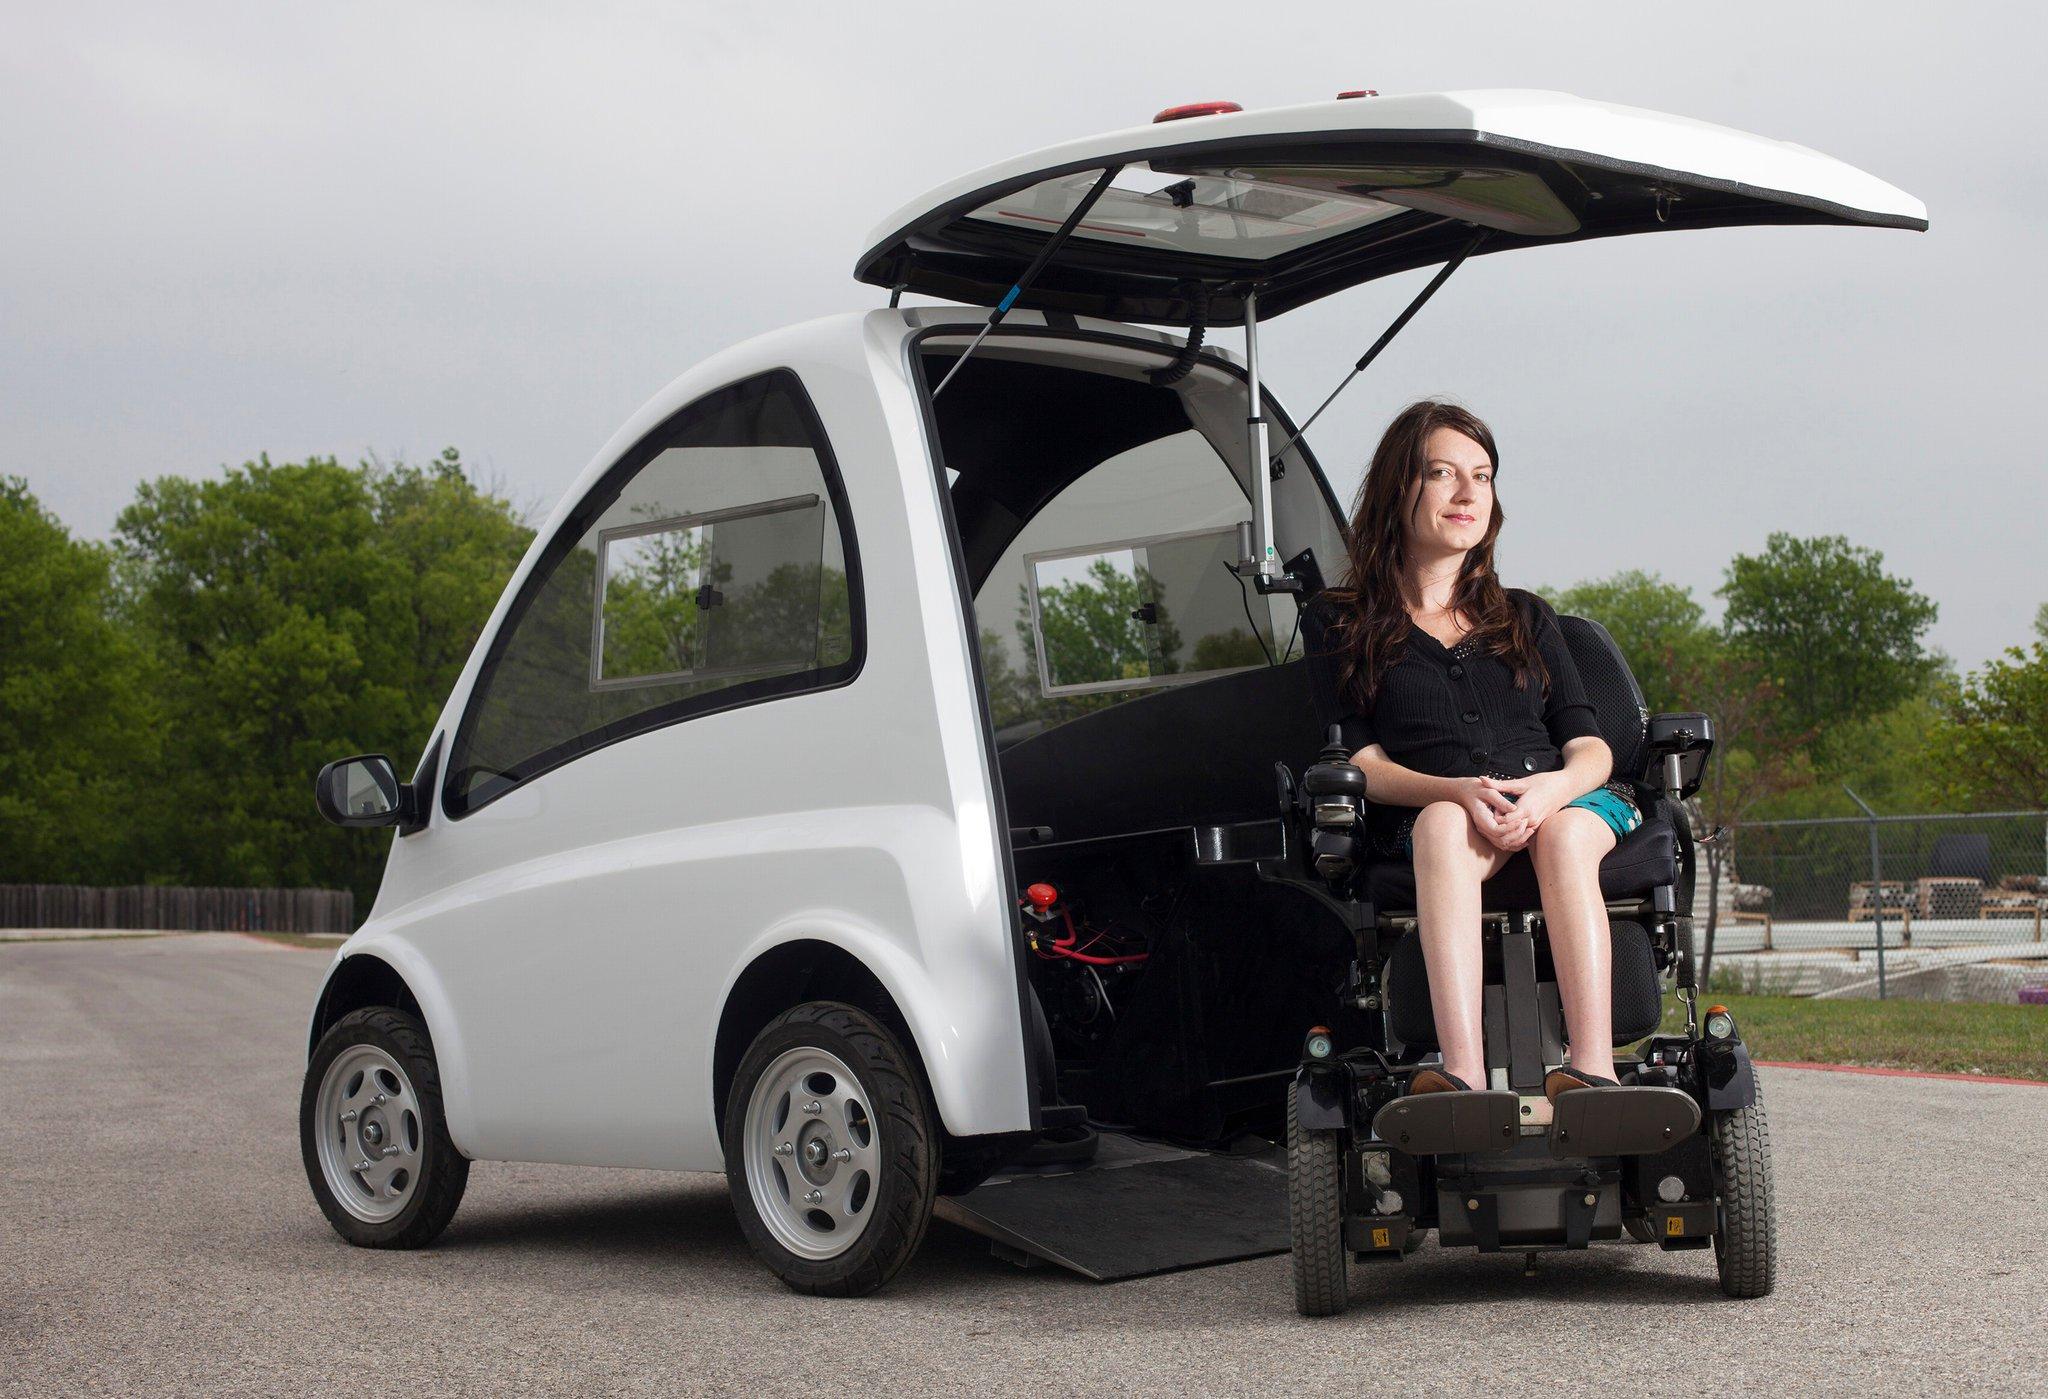 wheelchair genius lightest fishing chair reviews kenguru a car for drivers on wheelchairs techdrive